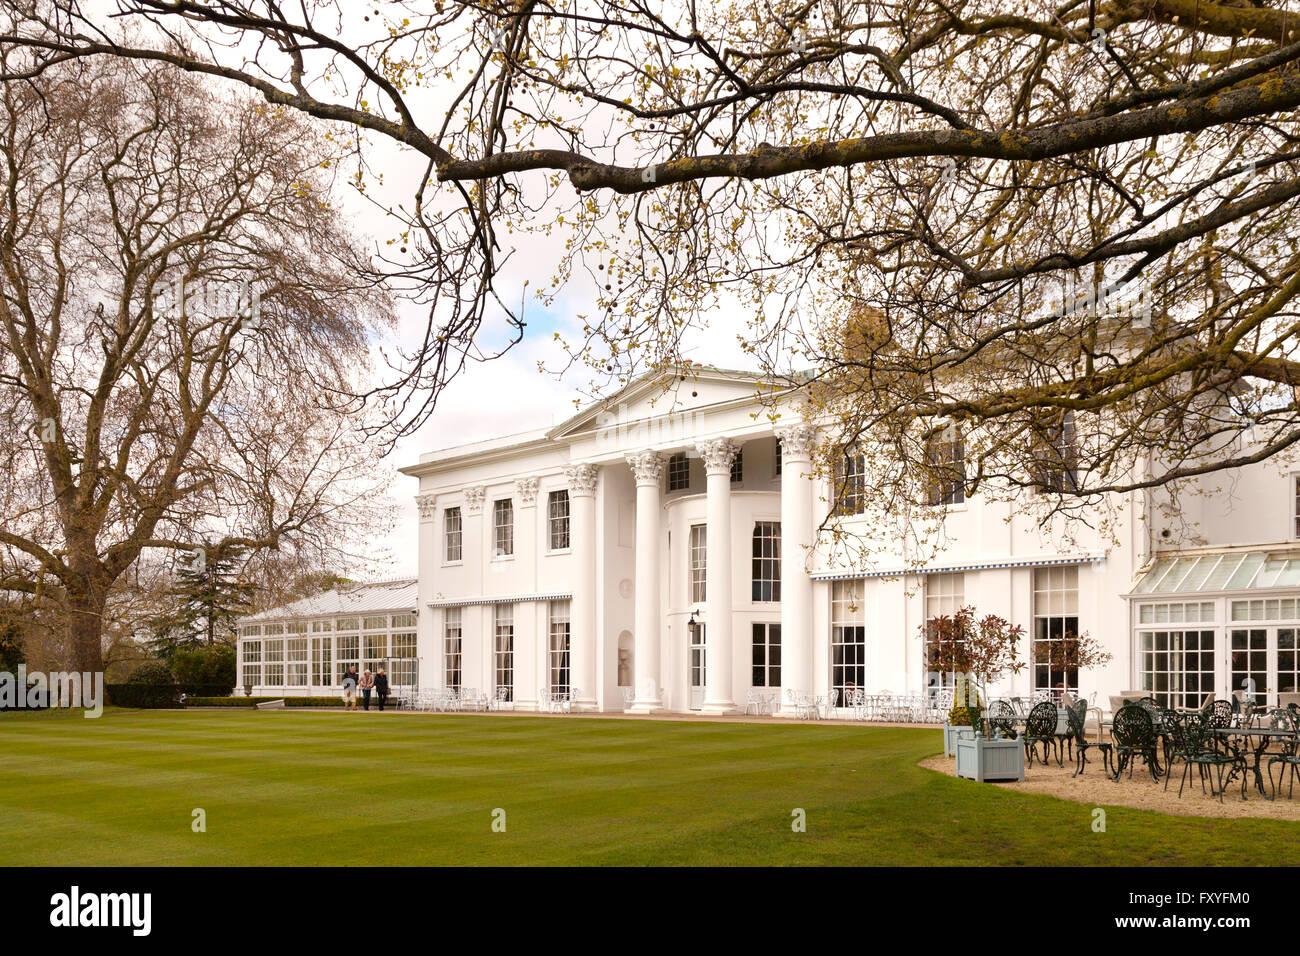 The exclusive Hurlingham Club buildings, Fulham, London UK - Stock Image